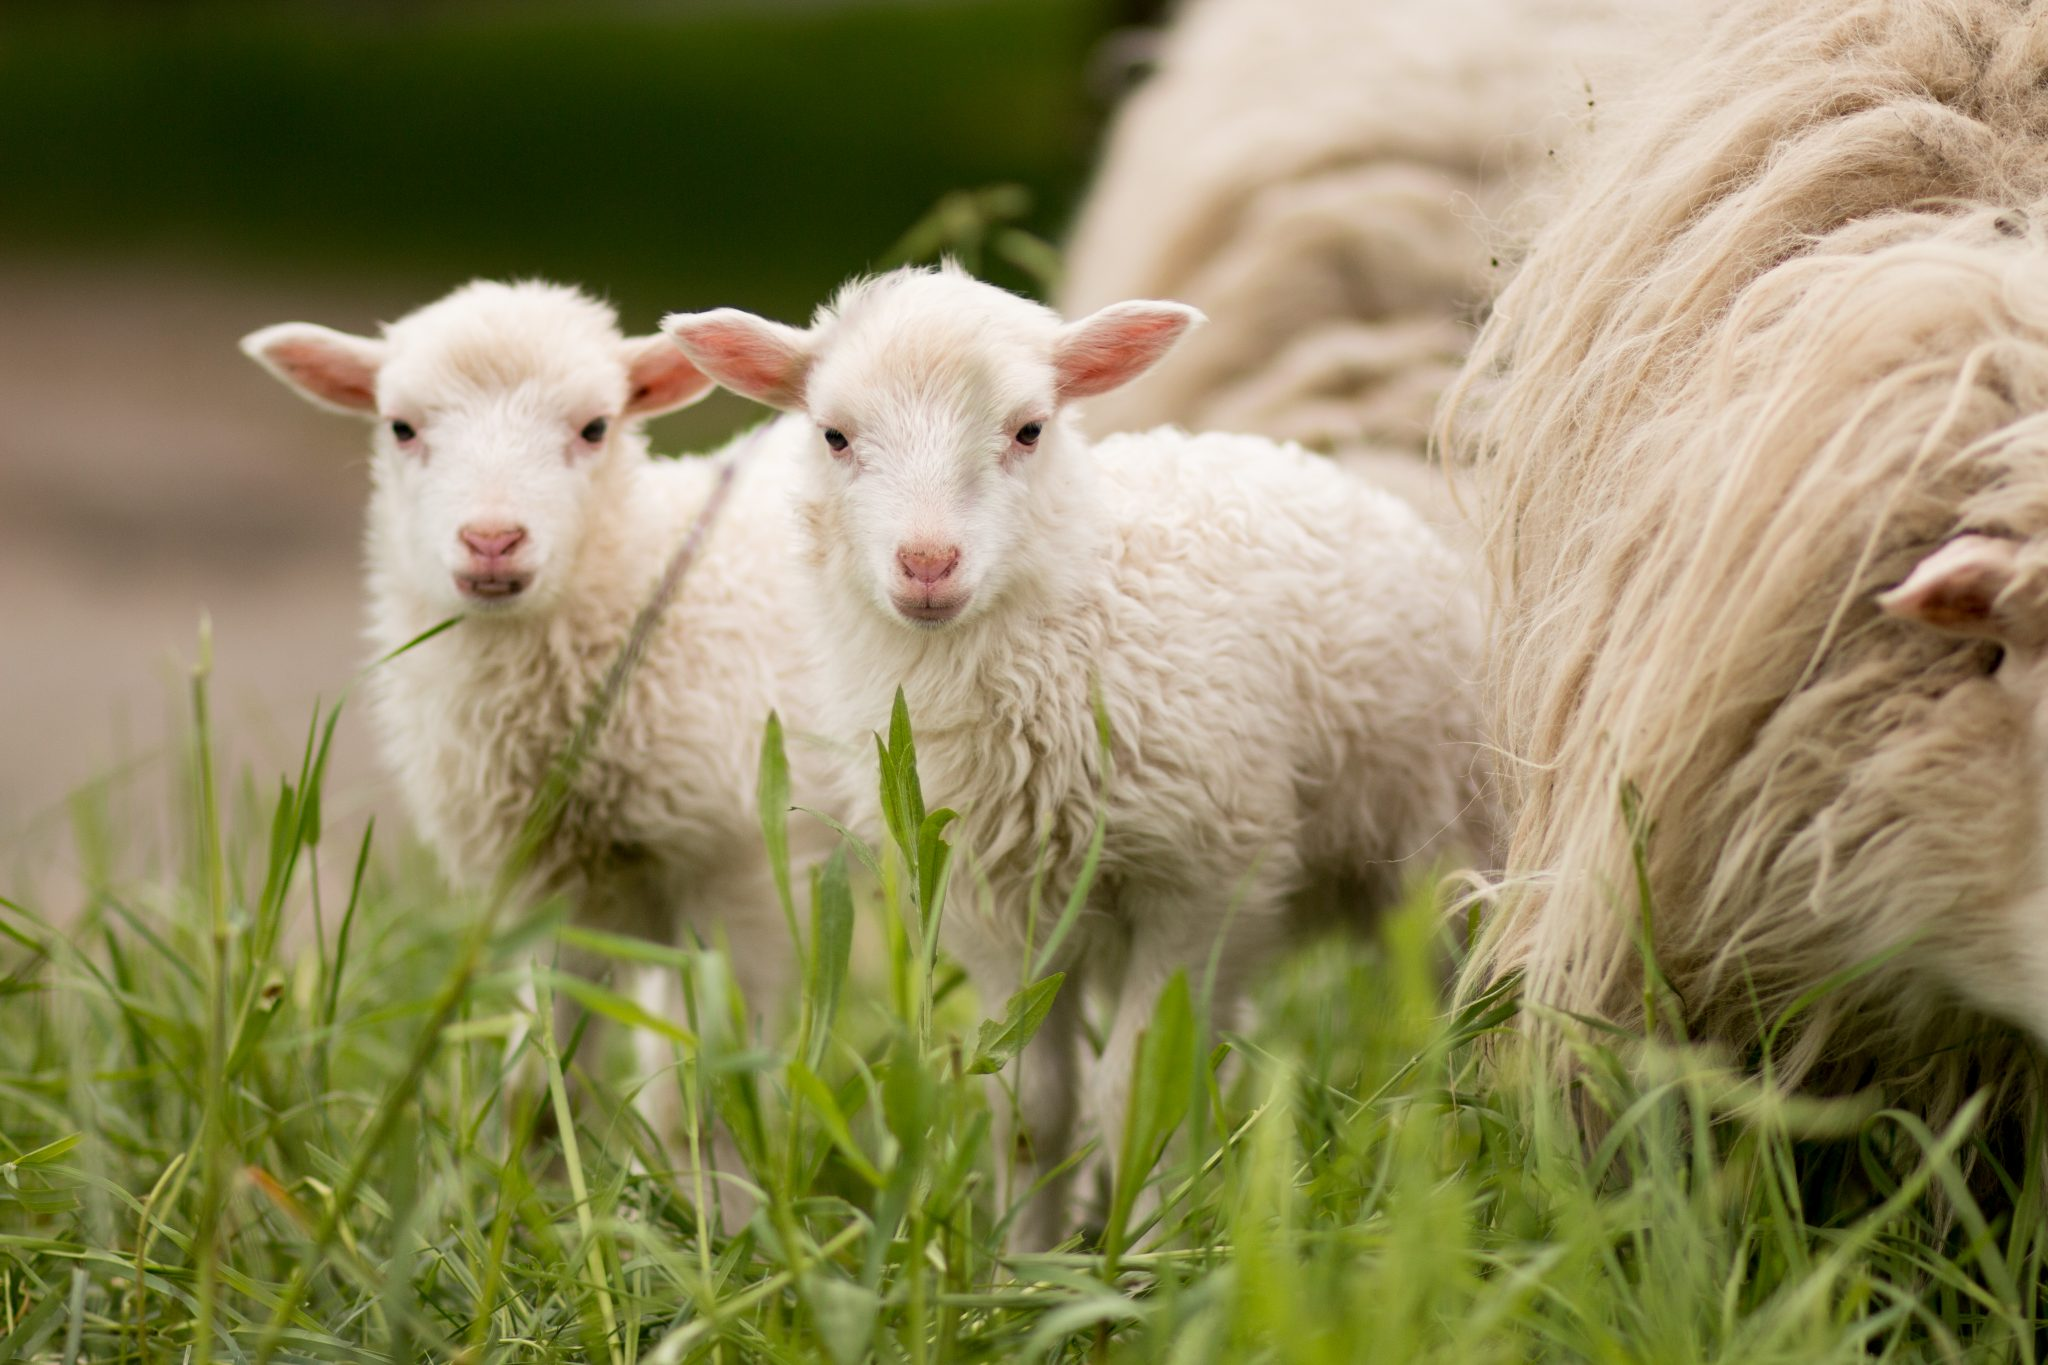 Sheep kids